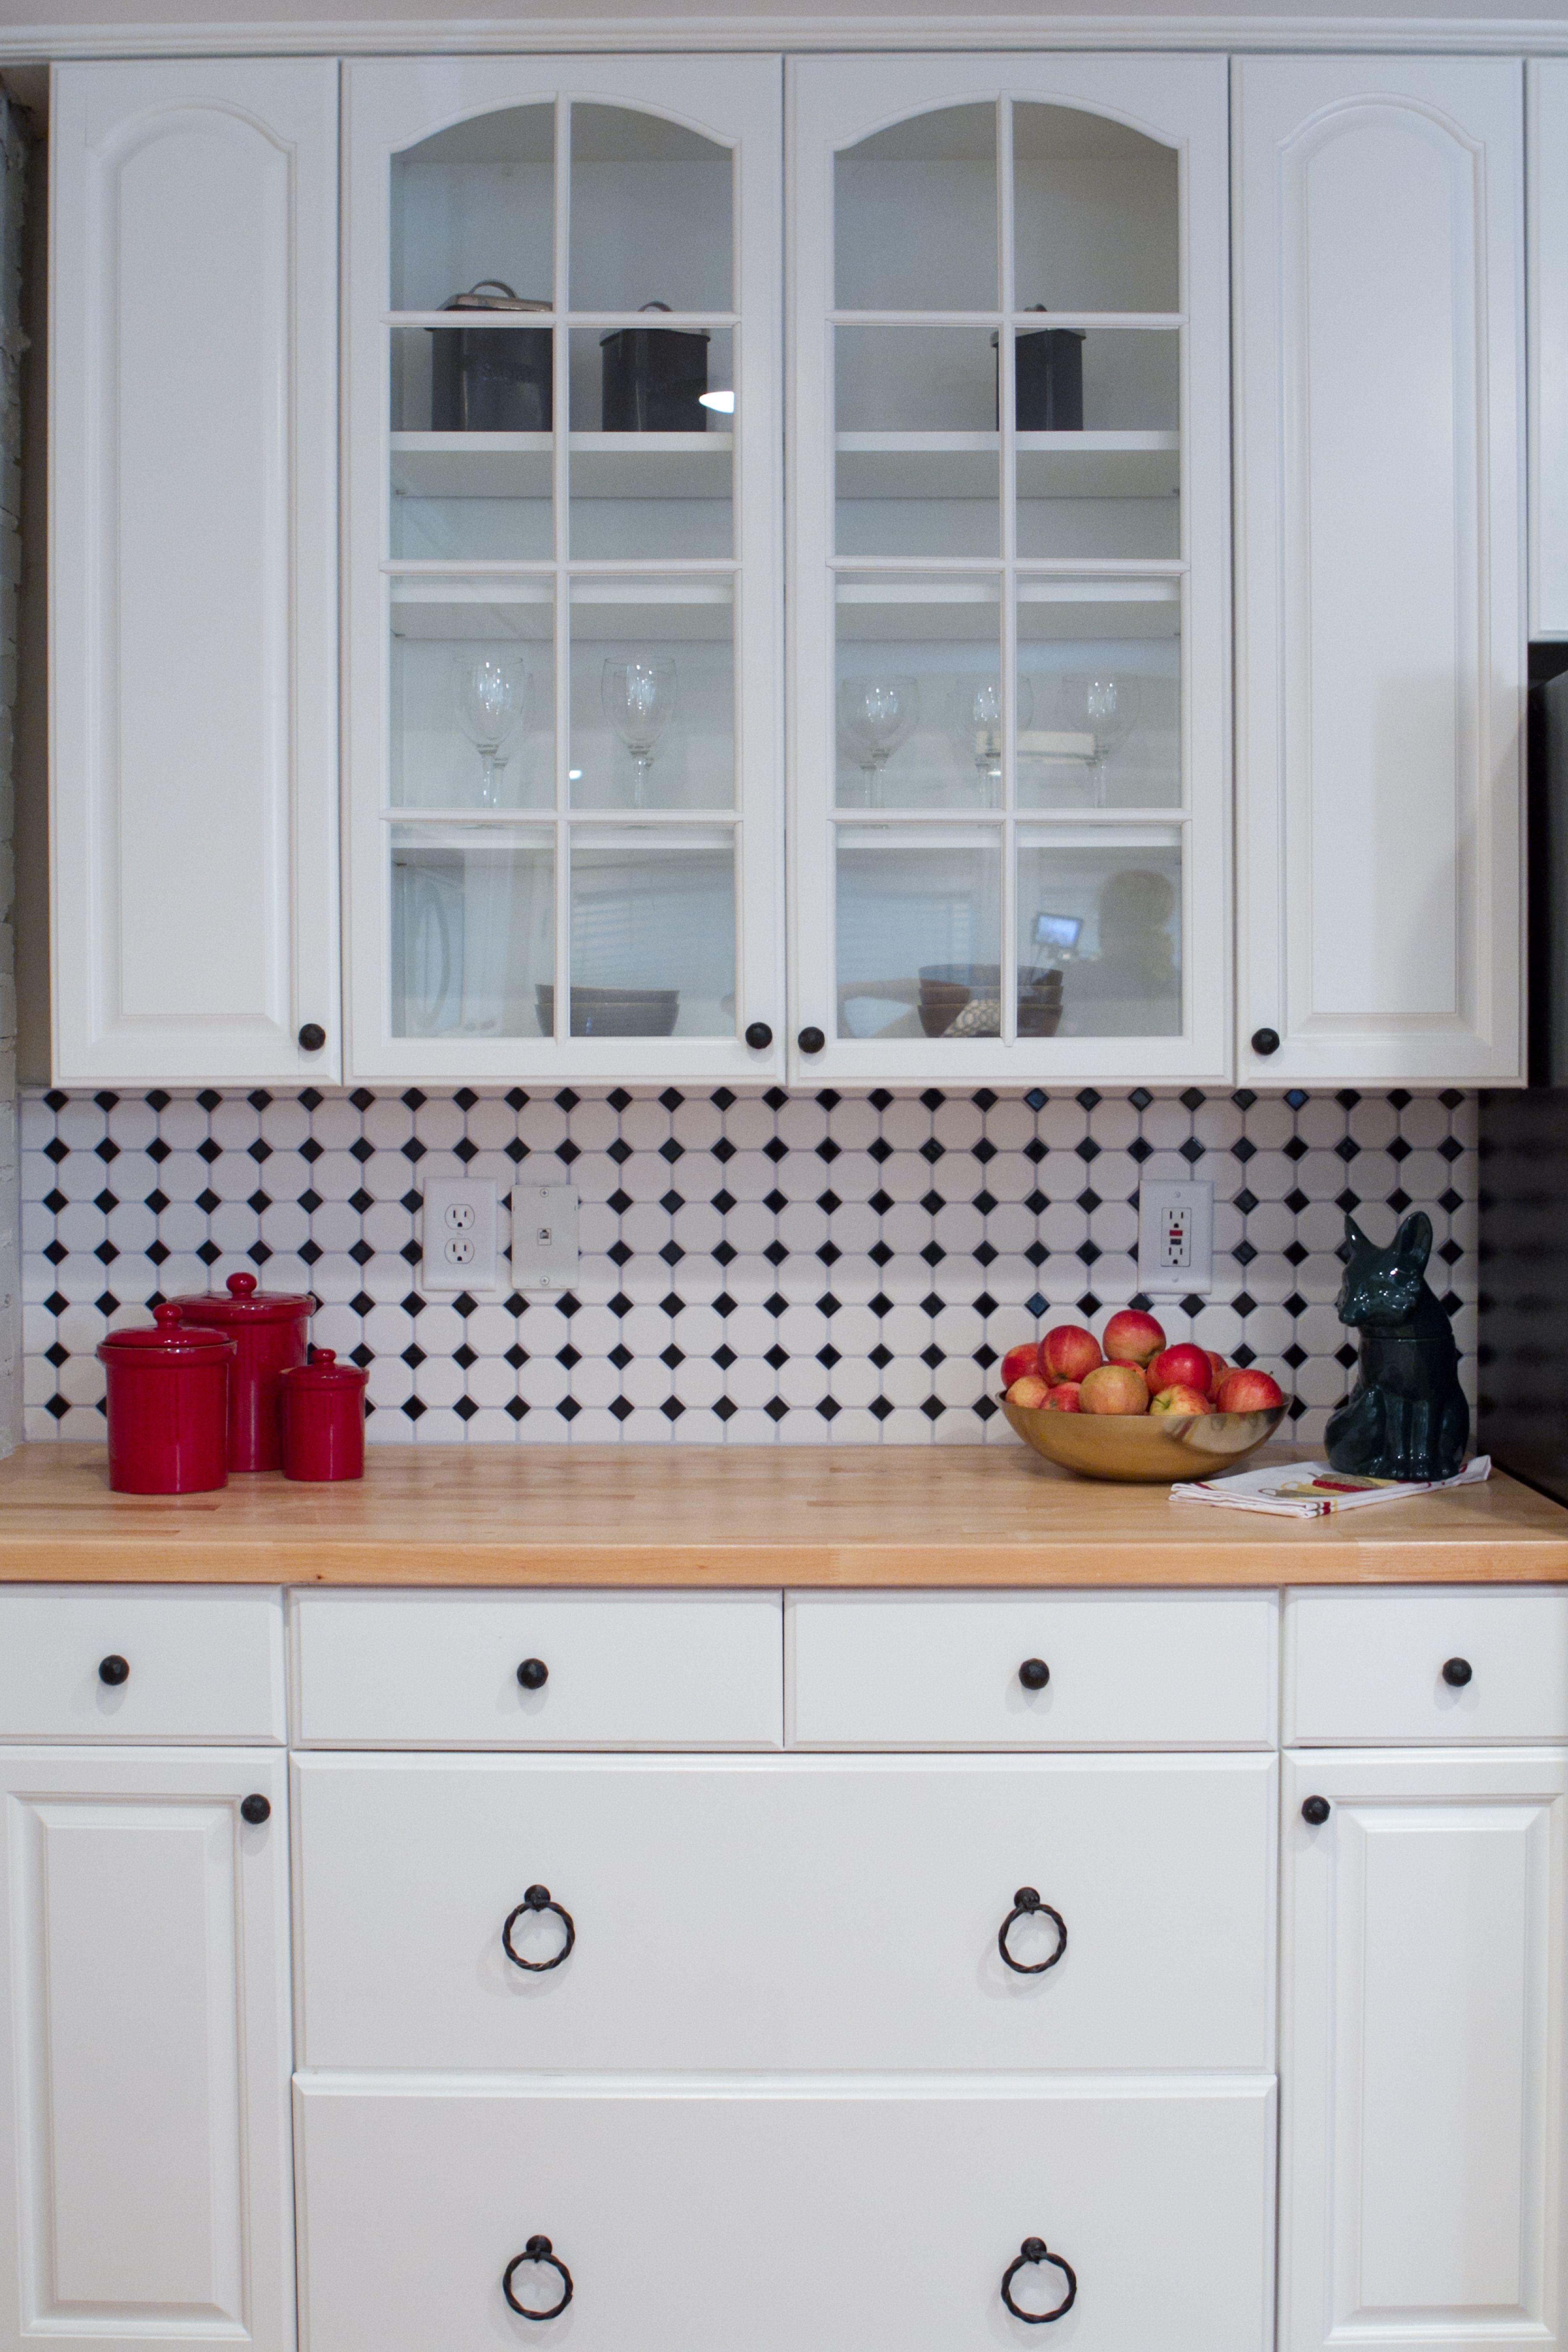 Kitchen Backsplash Tile Octagon Dot Matte White With Black